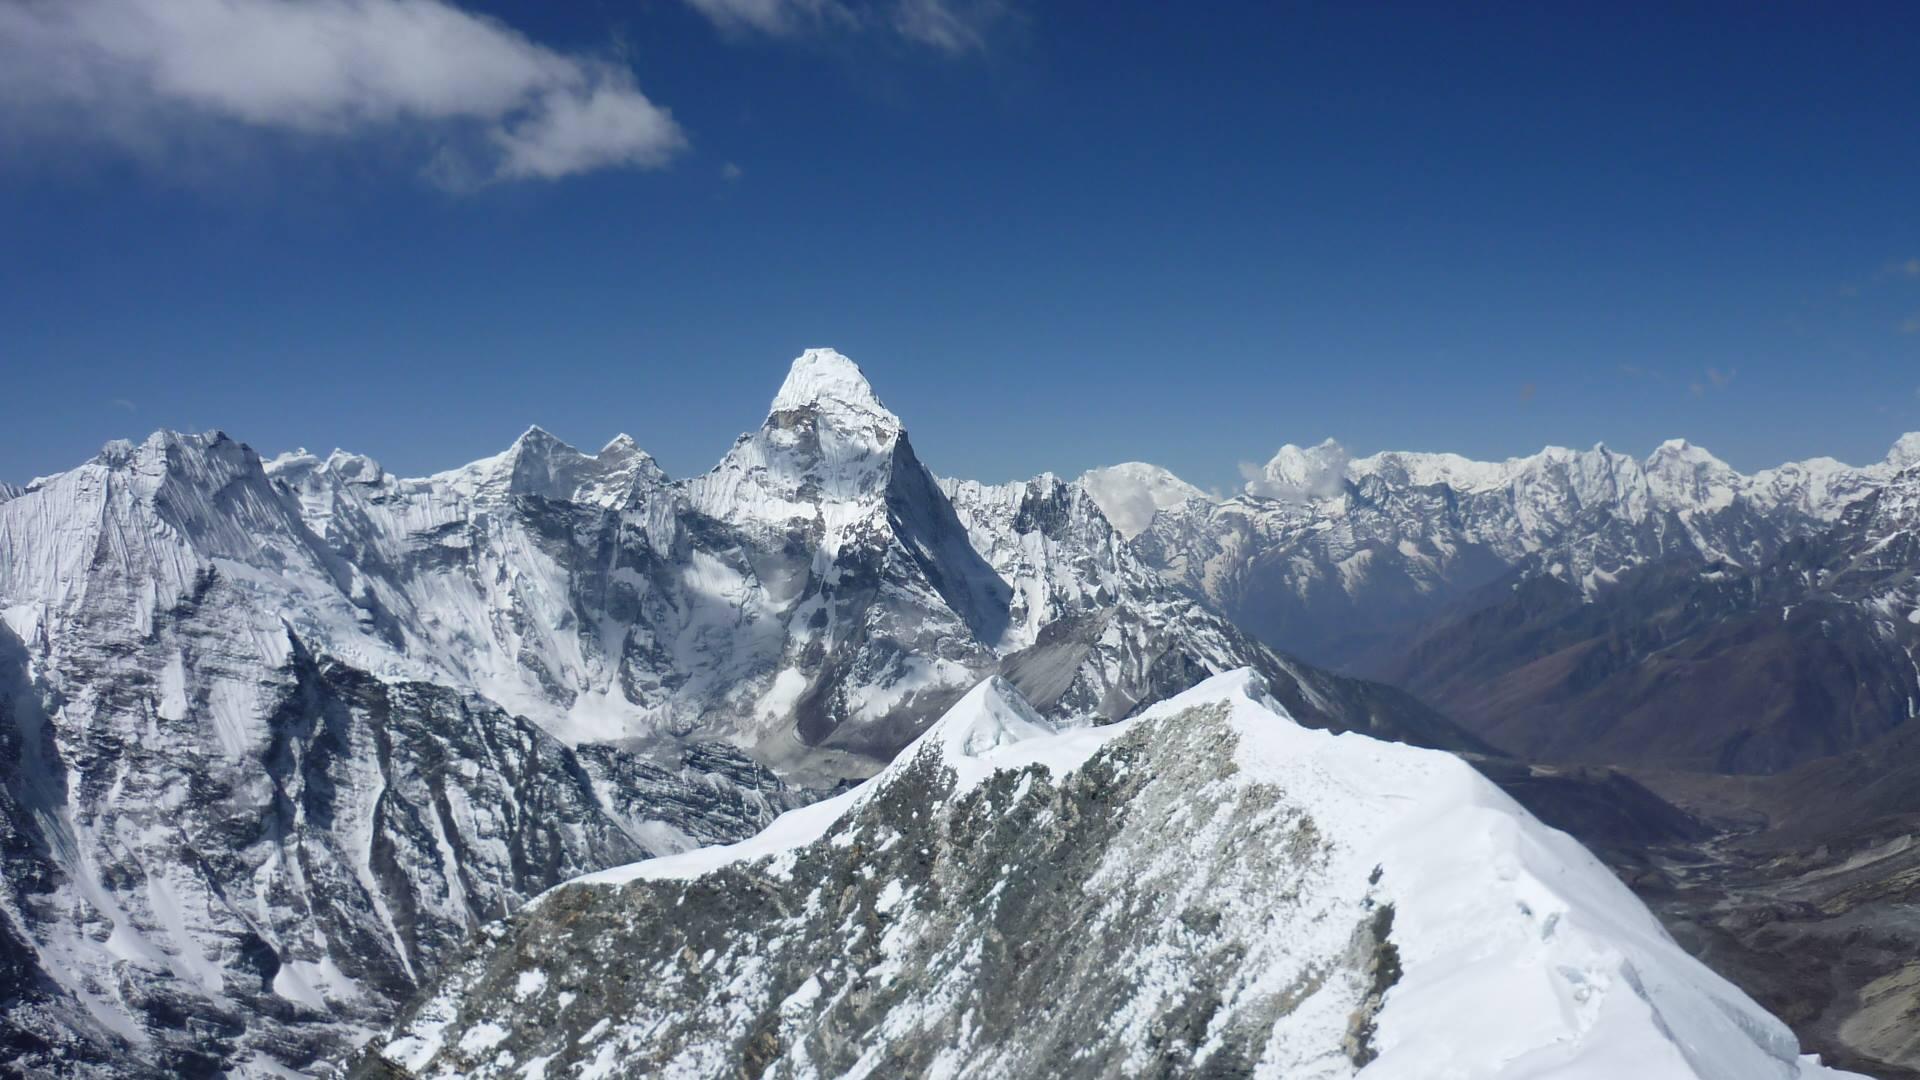 Summit of Ama Dablam